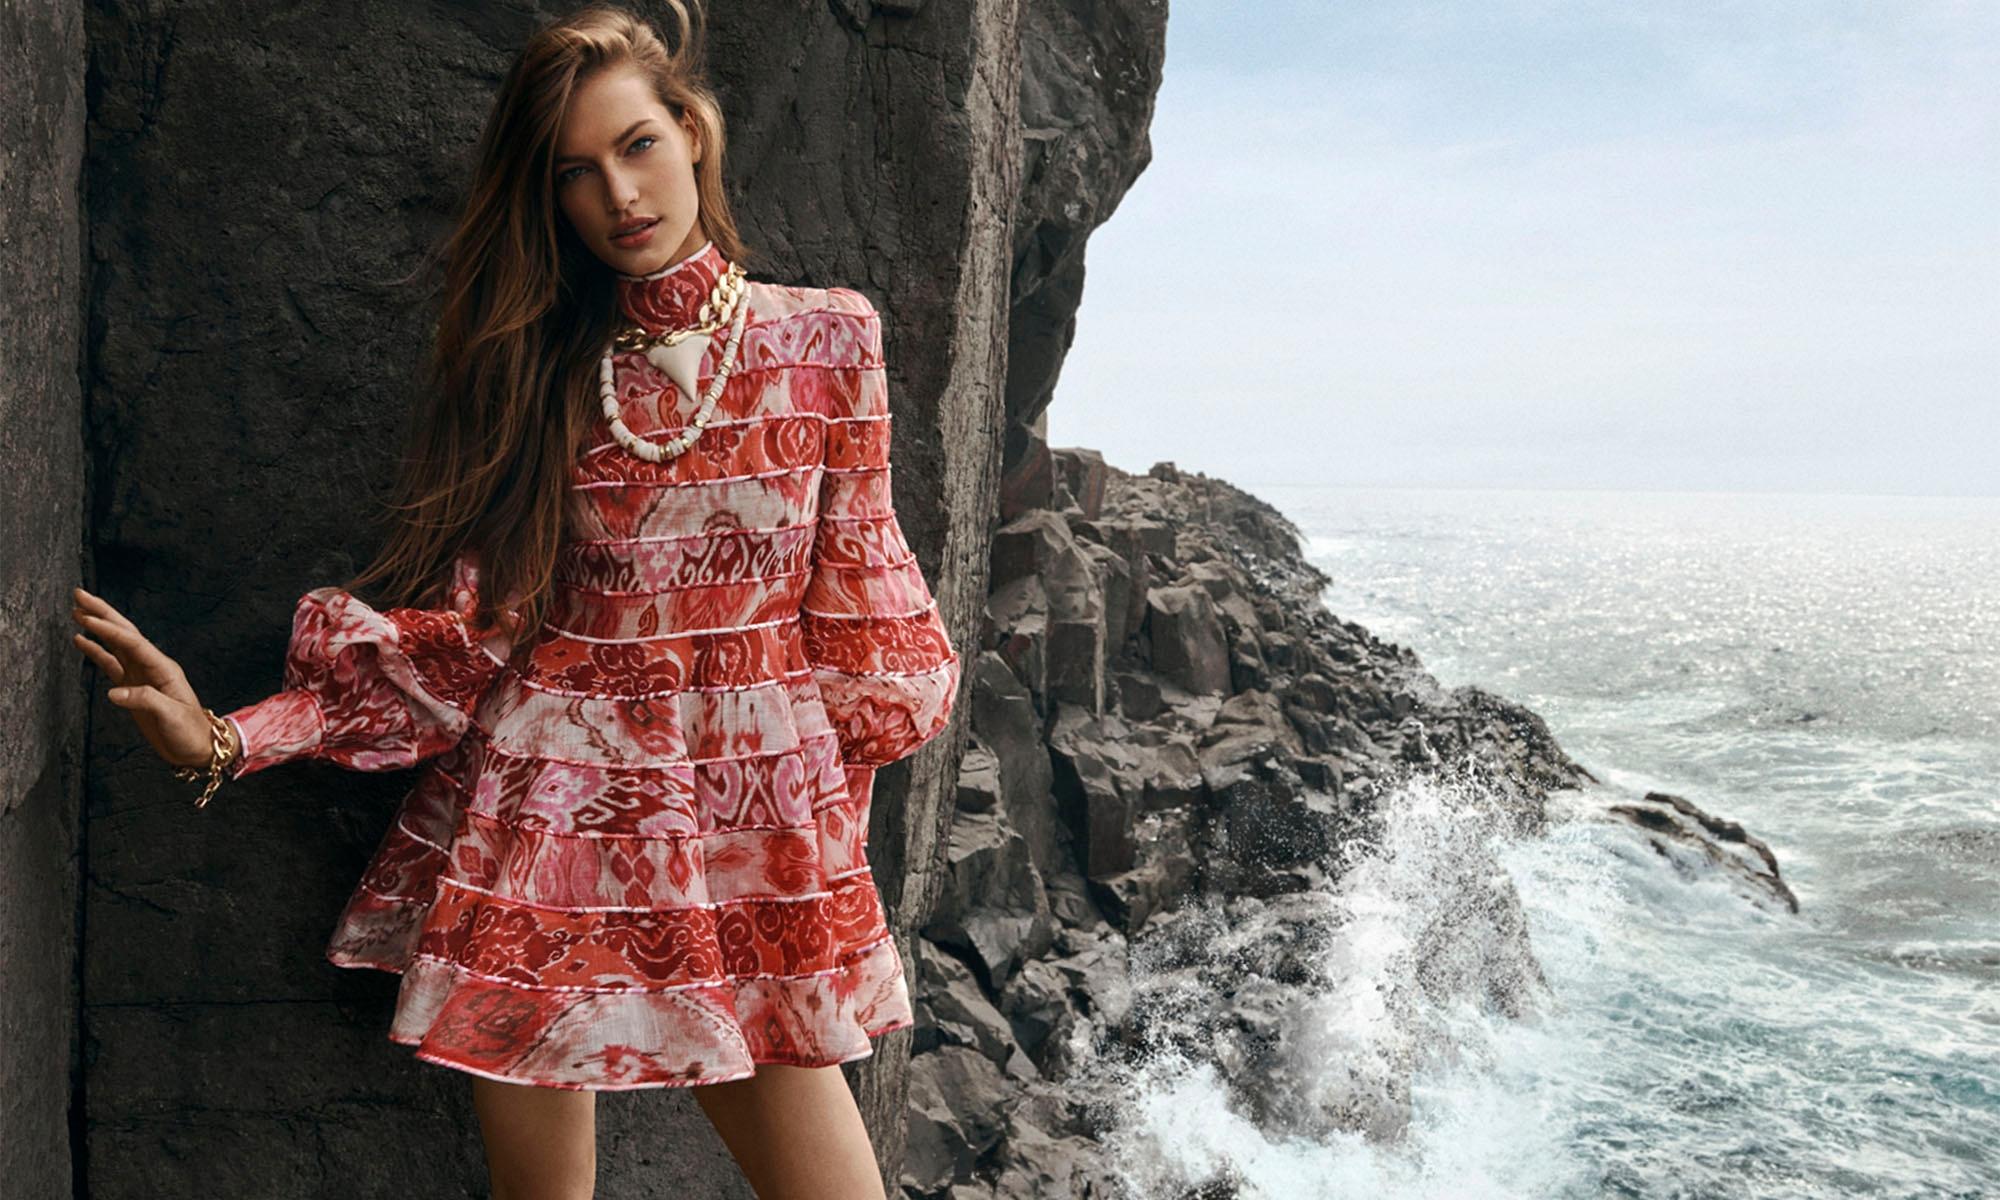 WOMAN STANDING ON THE ROCKS BY THE OCEAN WEARING Wavelength Spliced Mini, Spliced Pink Ikat